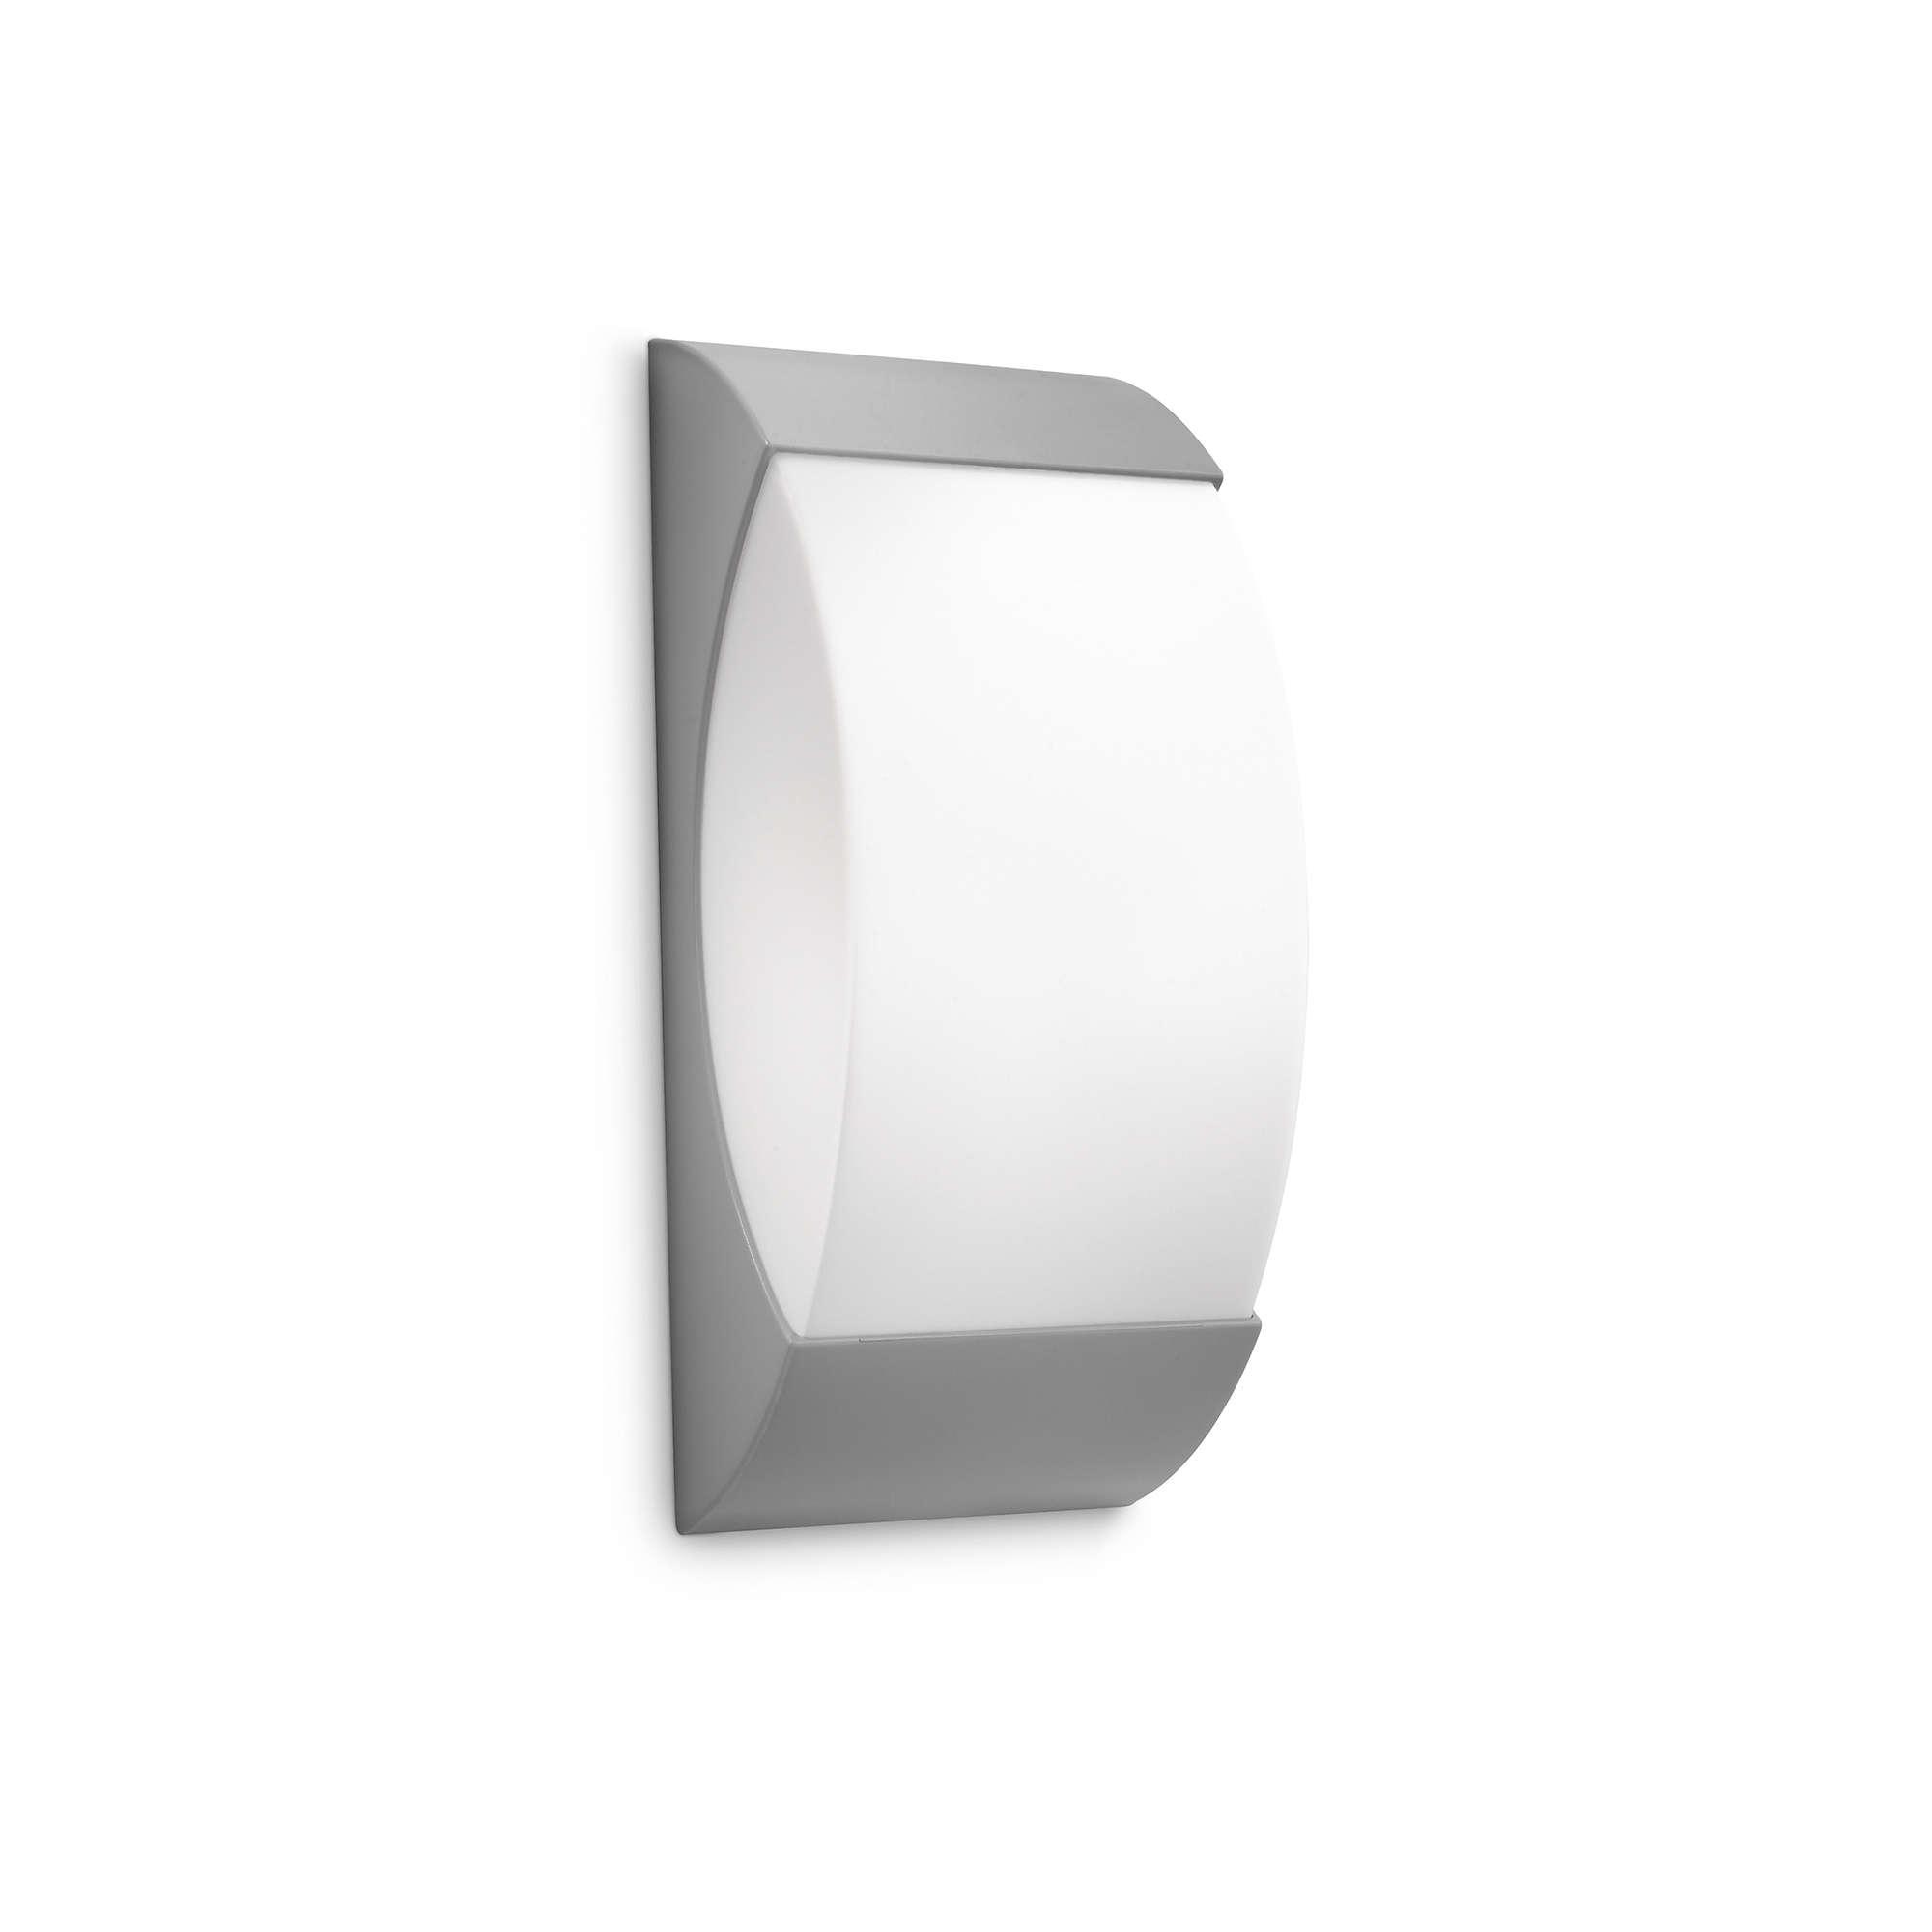 Philips STARRY zidna lampa - 172508716